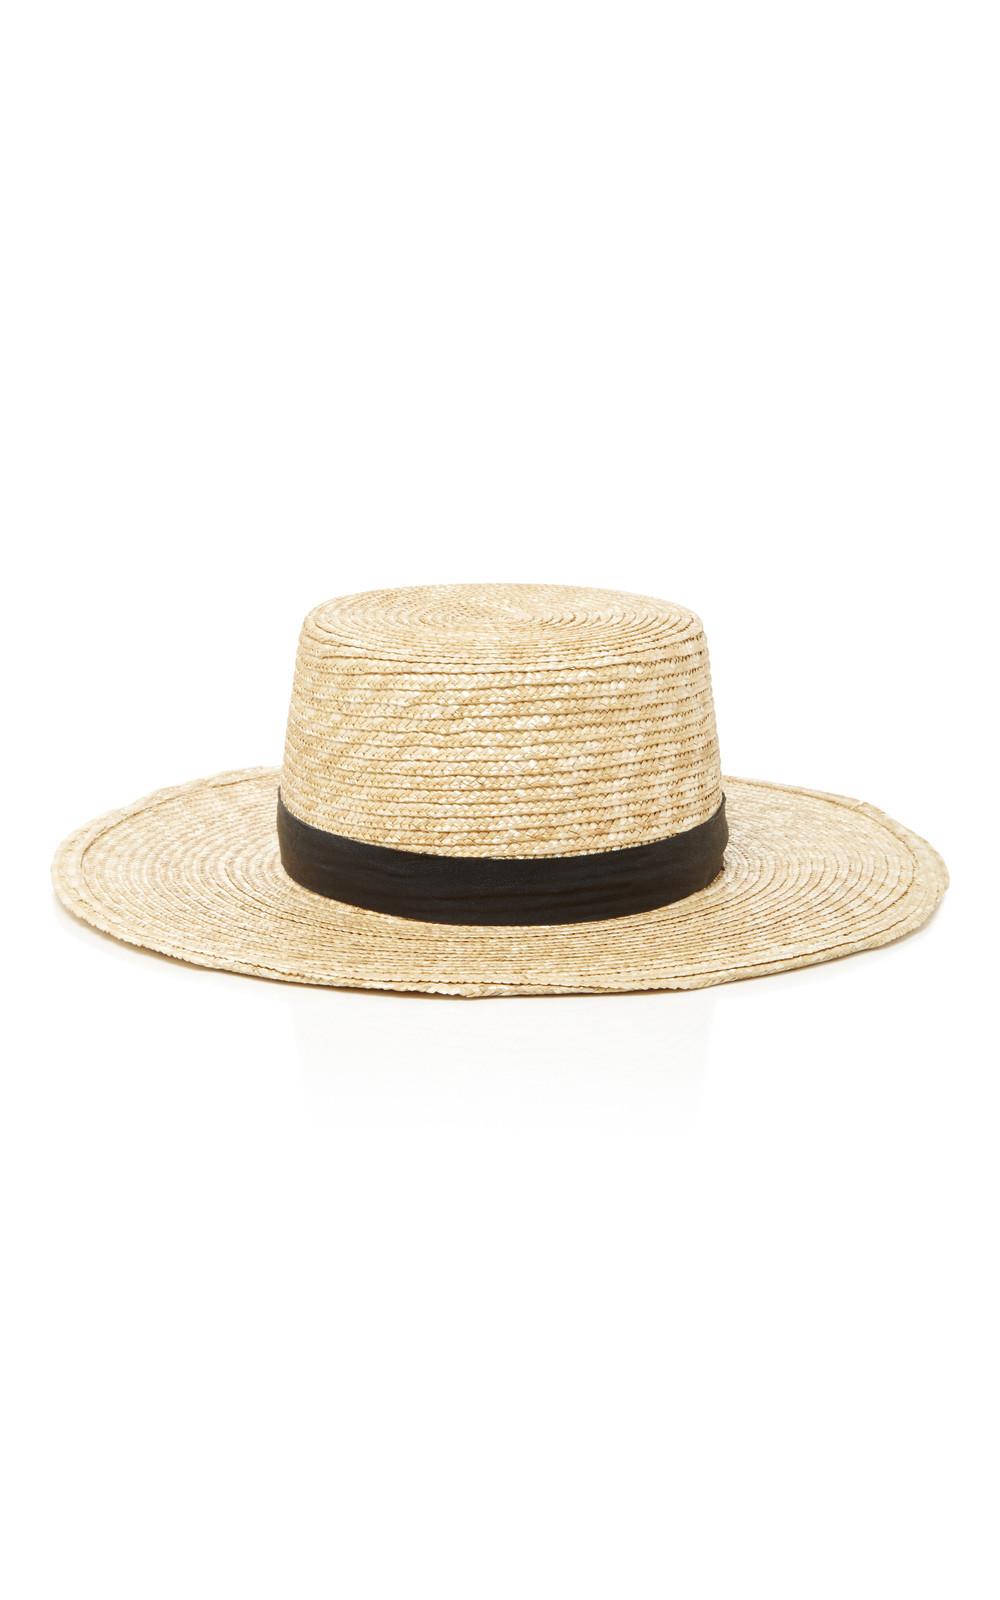 Janessa Leone Klint Bolero Hat in neutral